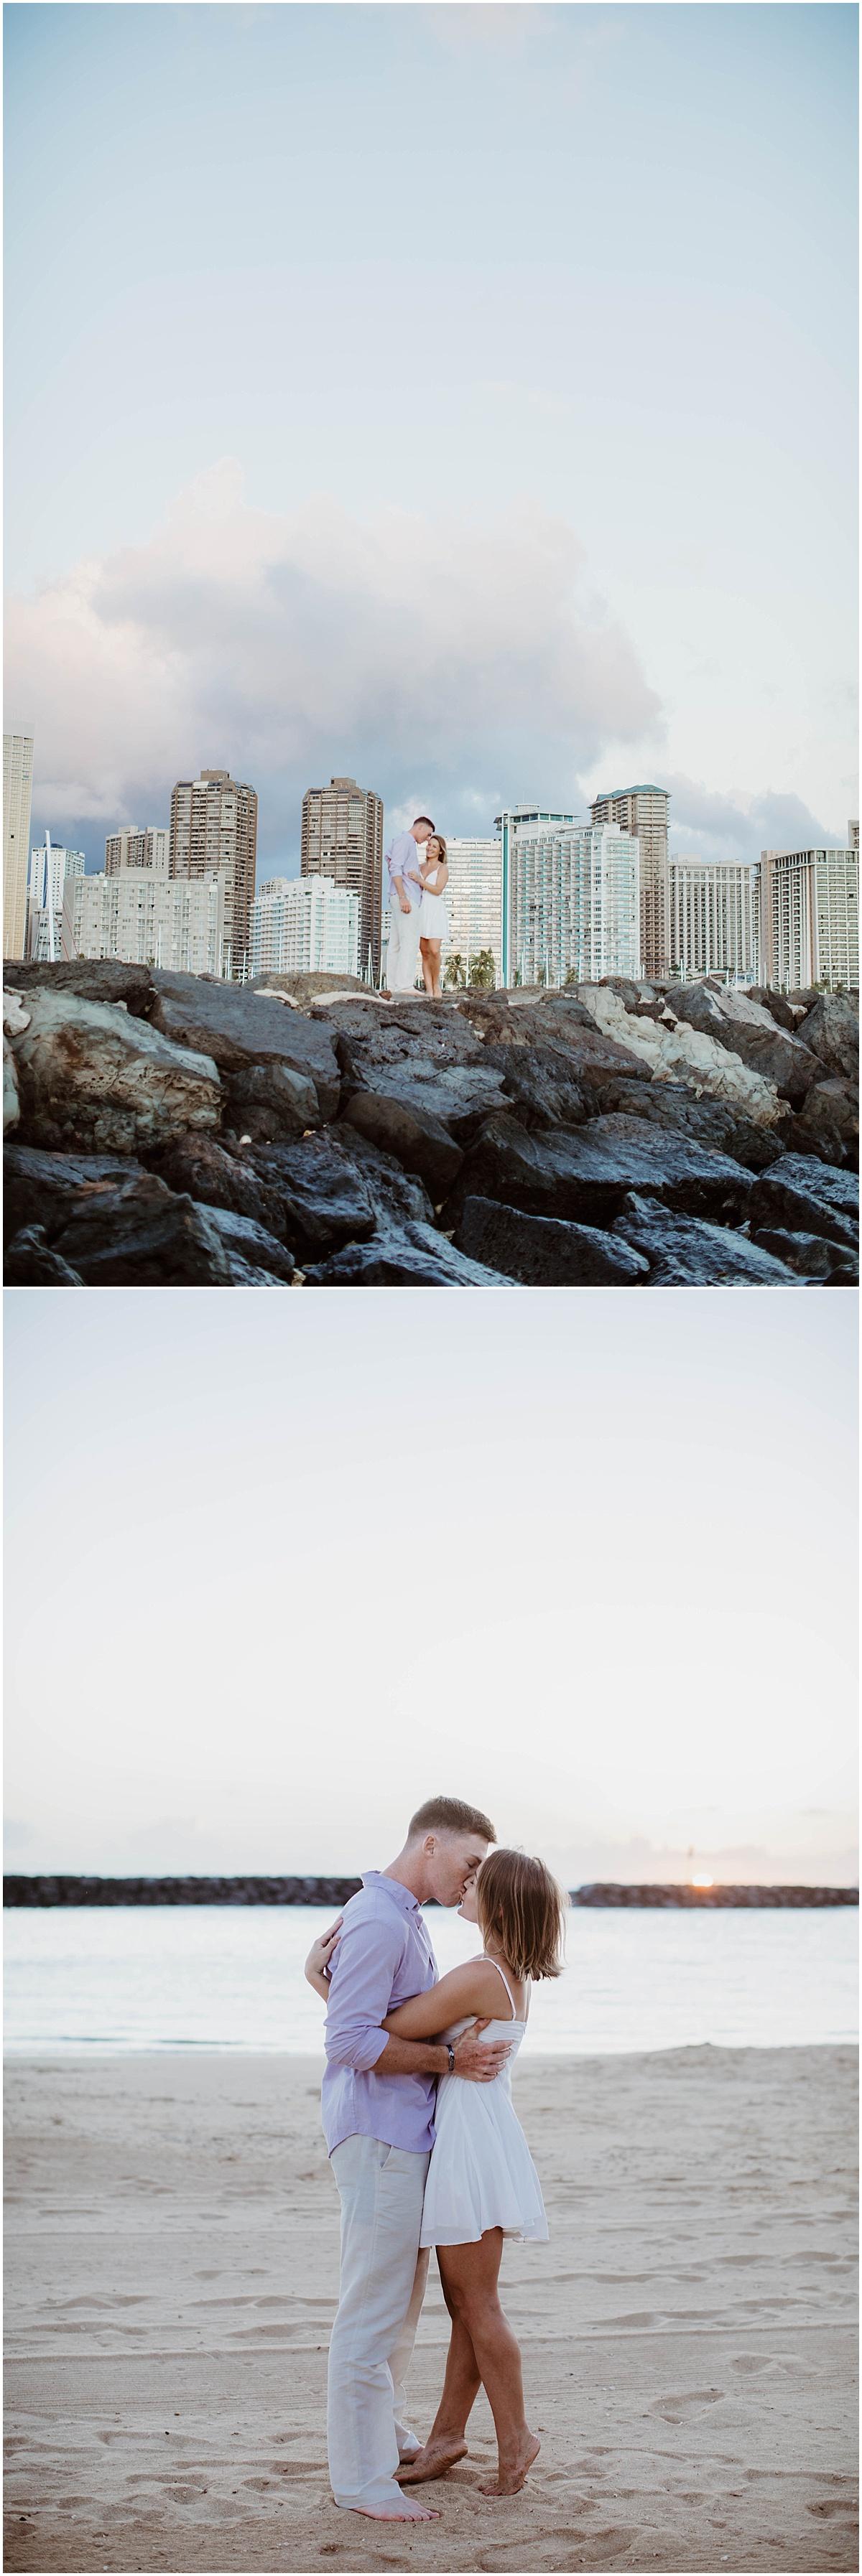 Cora Jane Photo Company - wedding photographer - new england wedding - mystic connecticut_0118.jpg